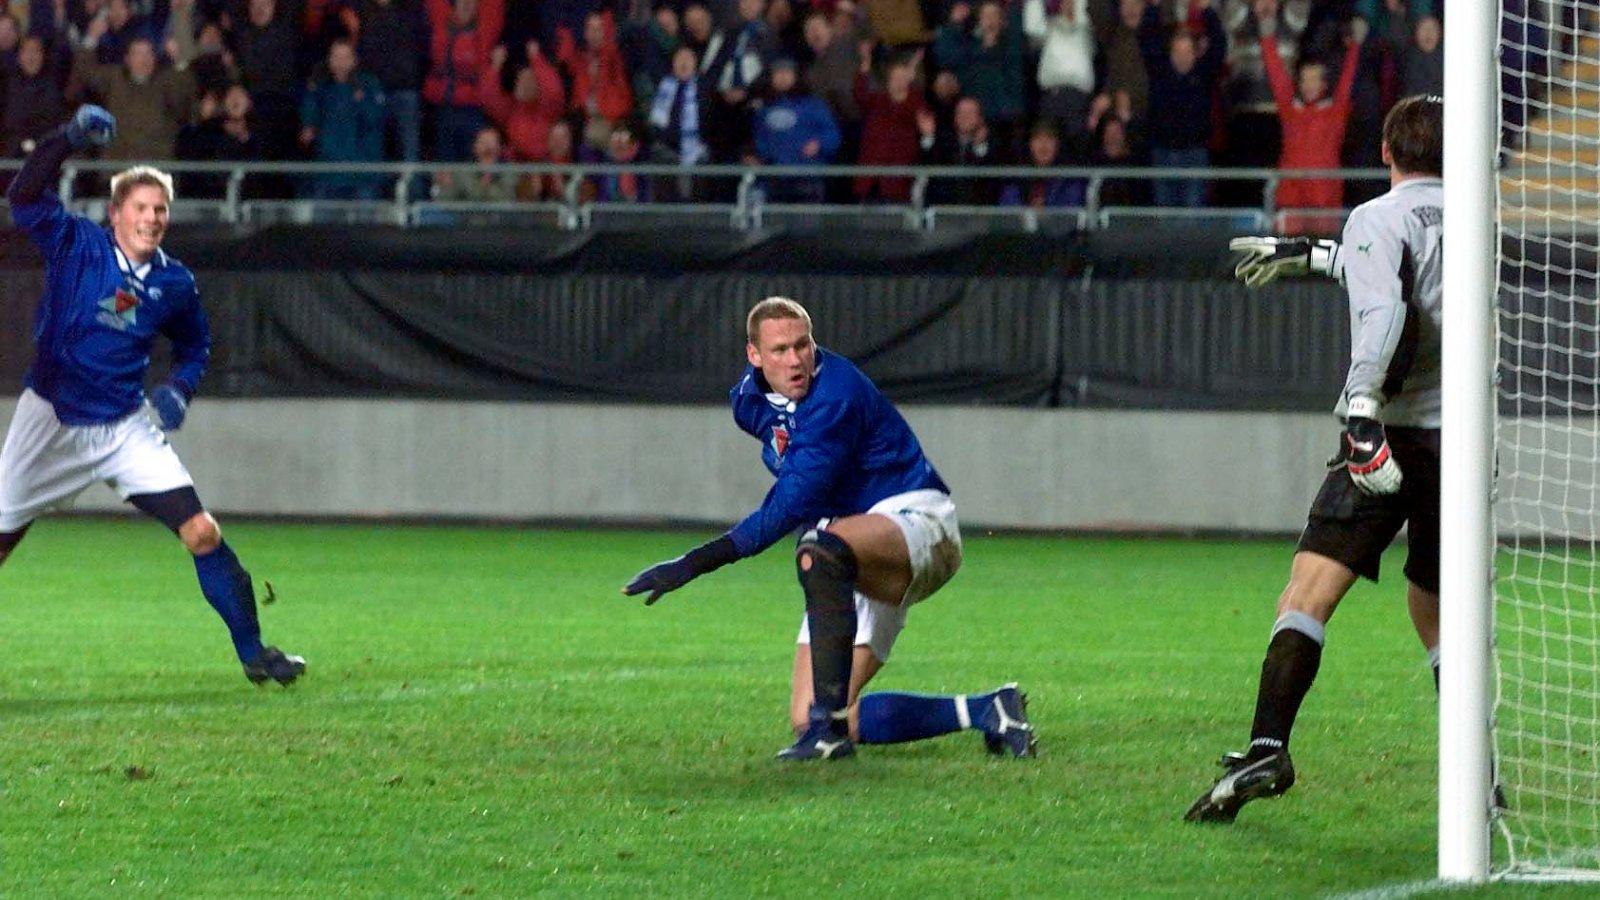 Champions League Molde-Olympiakos.Fotballspiller Andreas Lund. Spiss i Molde Fotball klubb.  Foto: Aftenposten